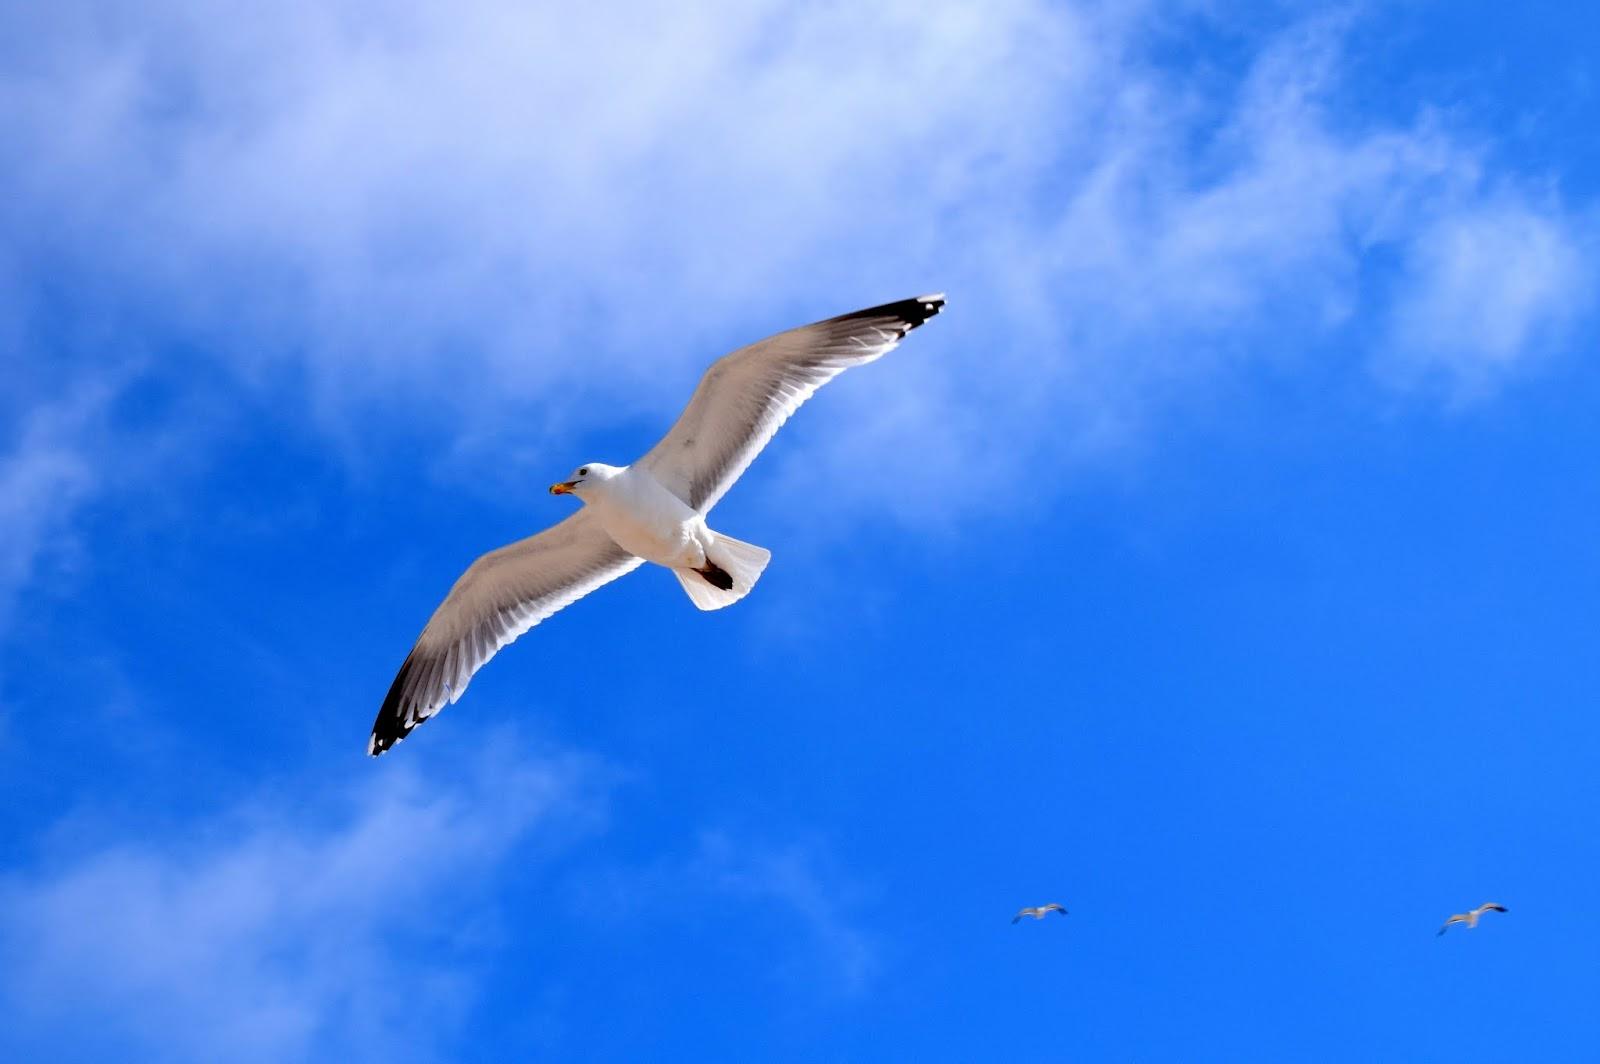 Sommer auf Sylt: Möwe am Himmel